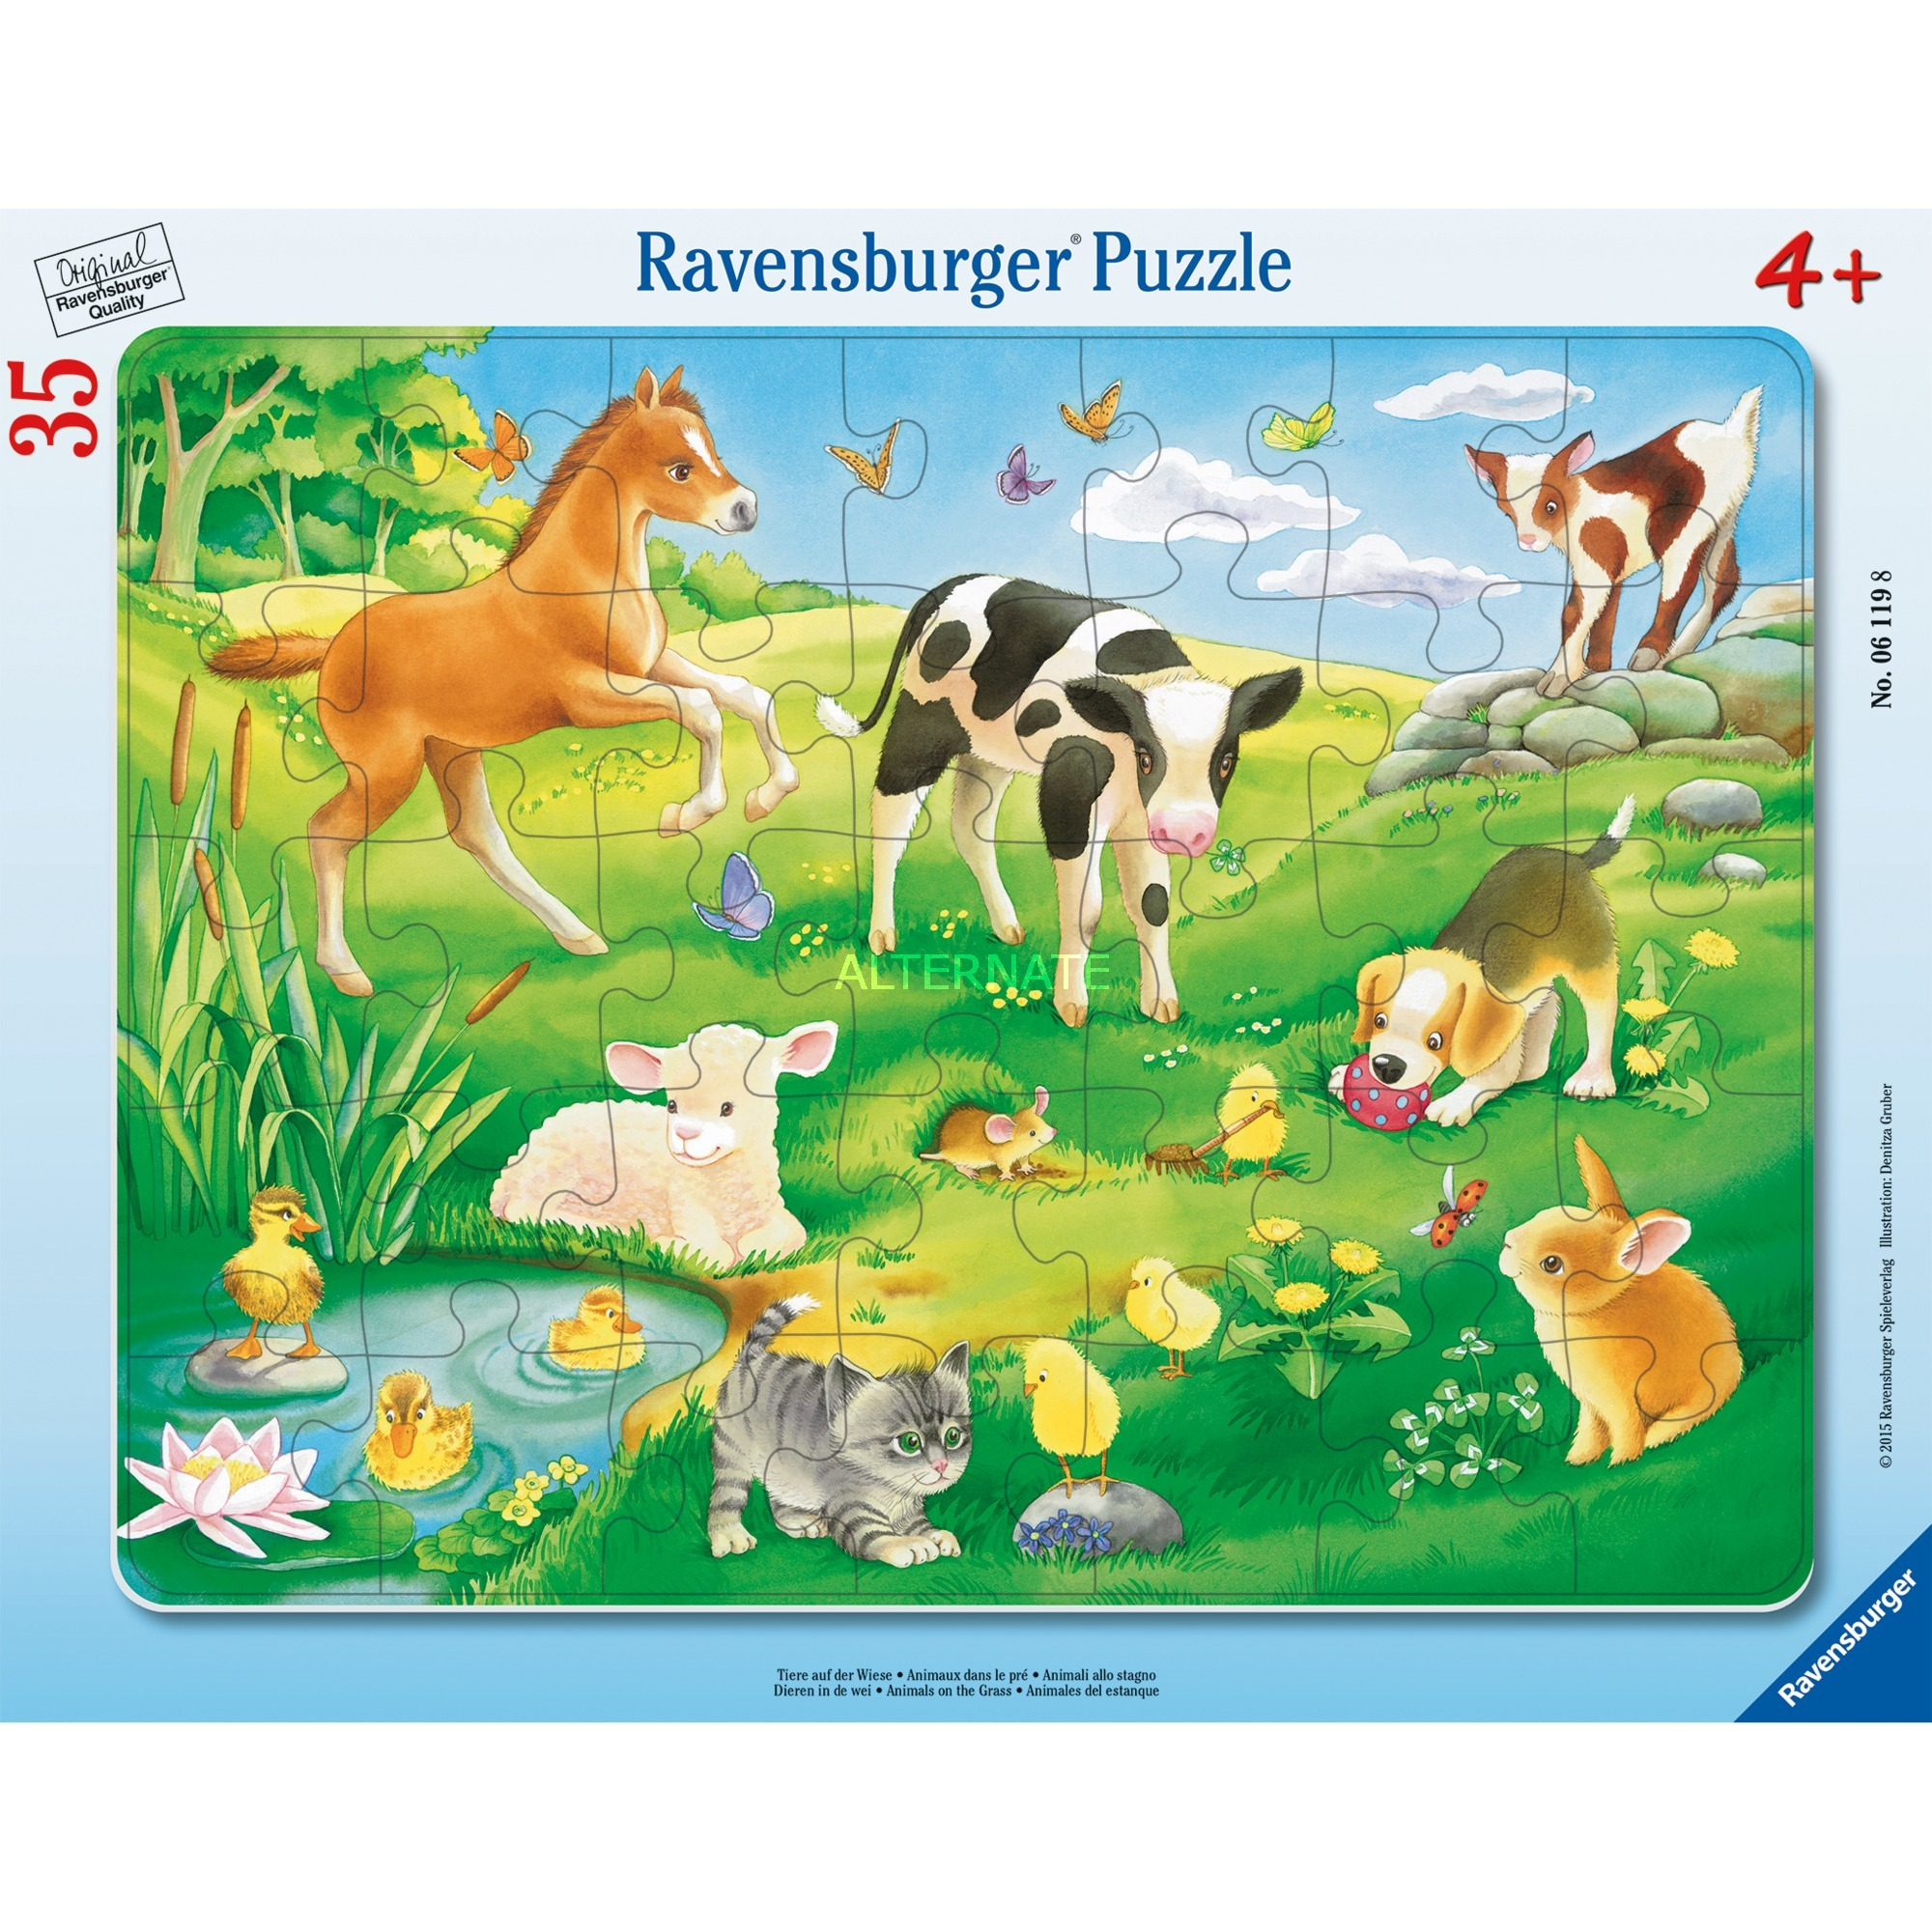 00.006.119 35pieza(s) puzzle